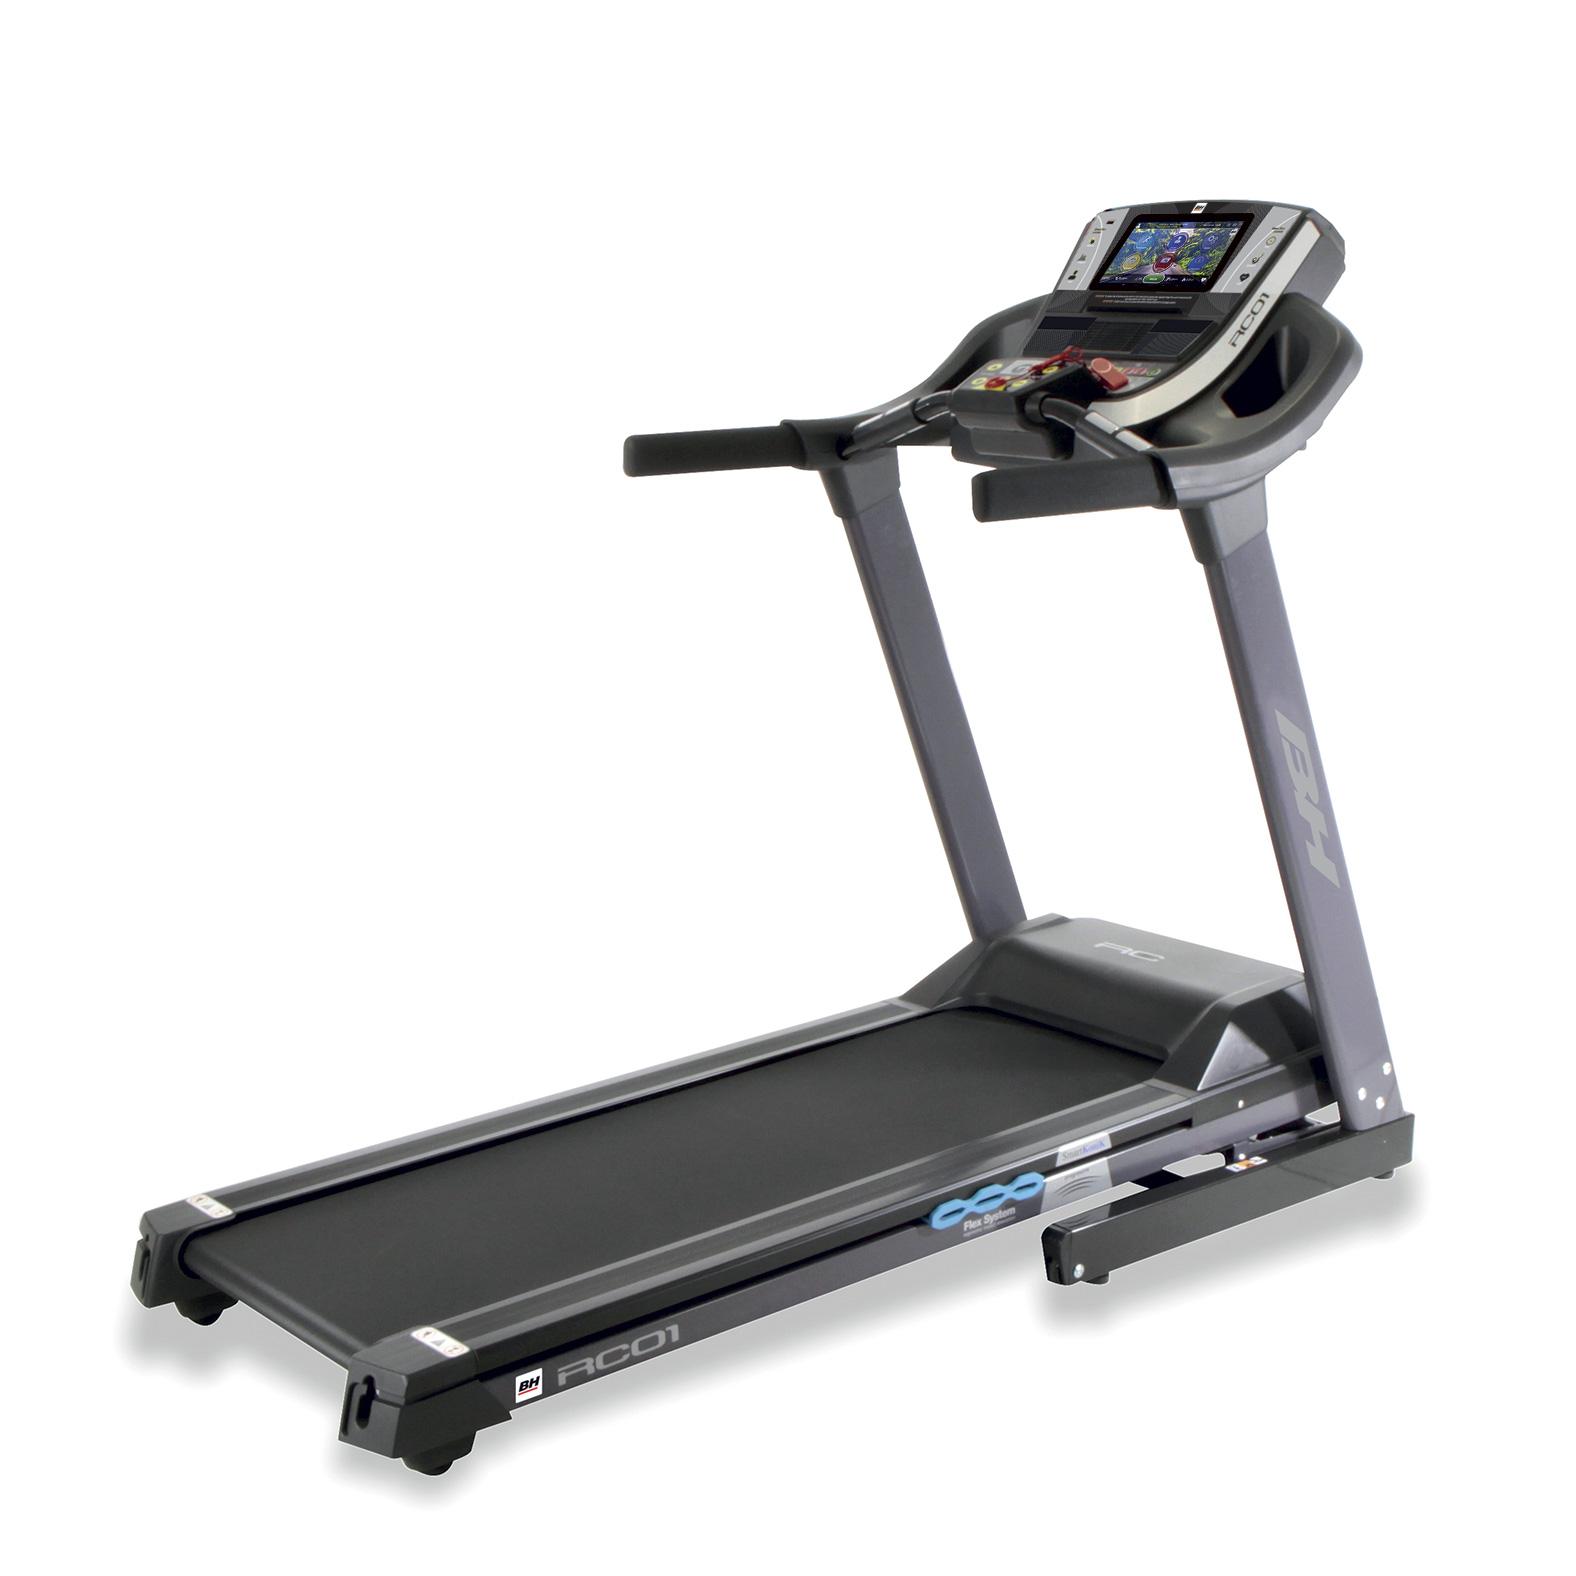 Bh fitness RC01 TFT